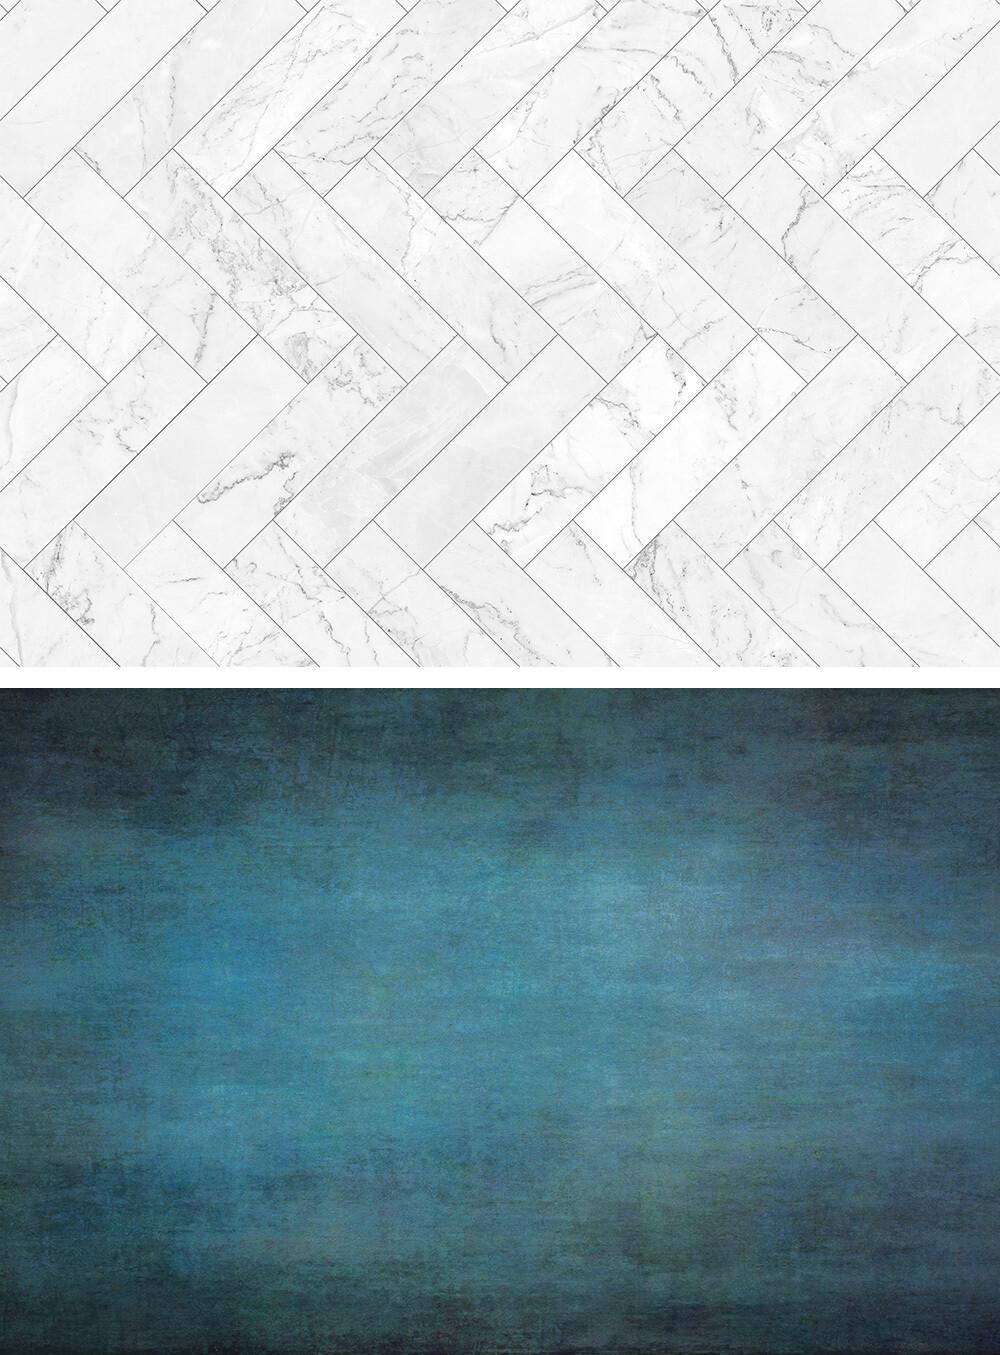 PVC Double Sided Backgrounds 58x86 cm - E06